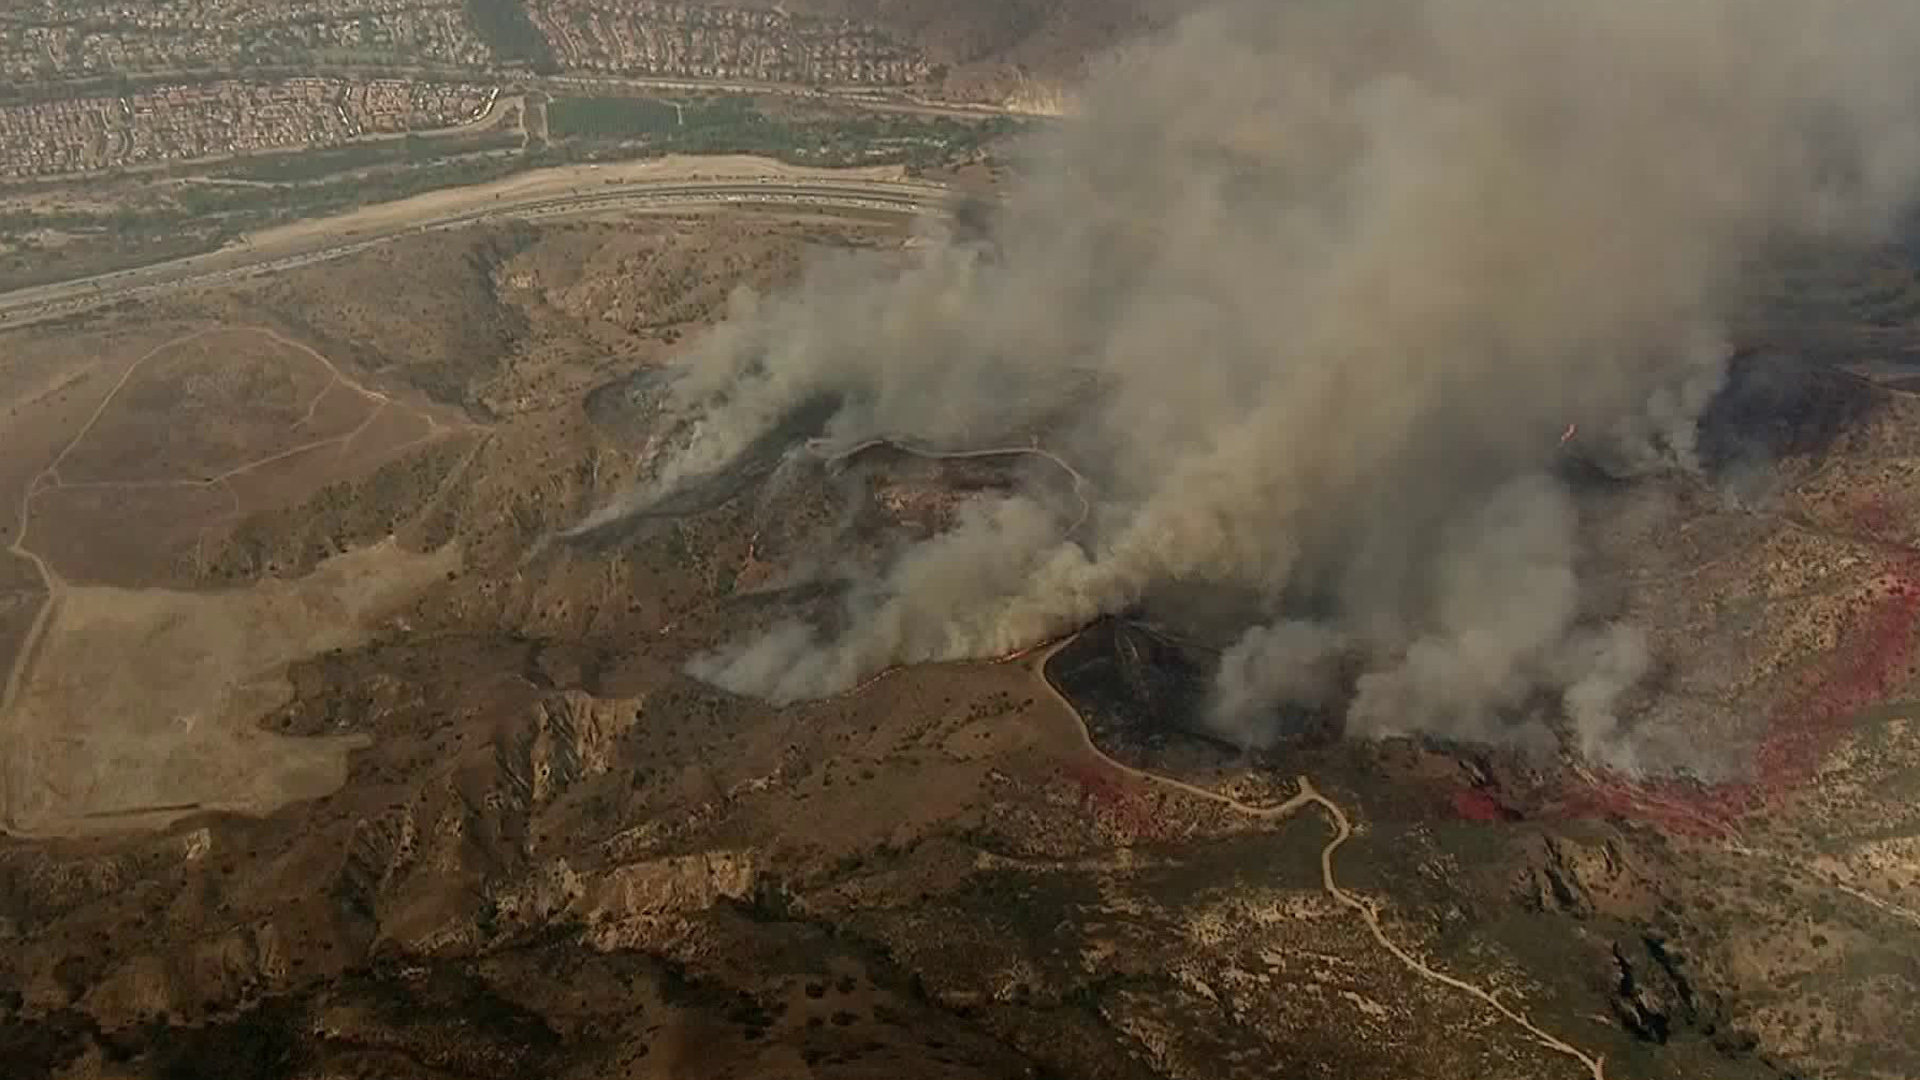 The Canyon Fire burns near the 91 Freeway near the border of Anaheim and Corona on Sept. 25, 2017. (Credit: KTLA)